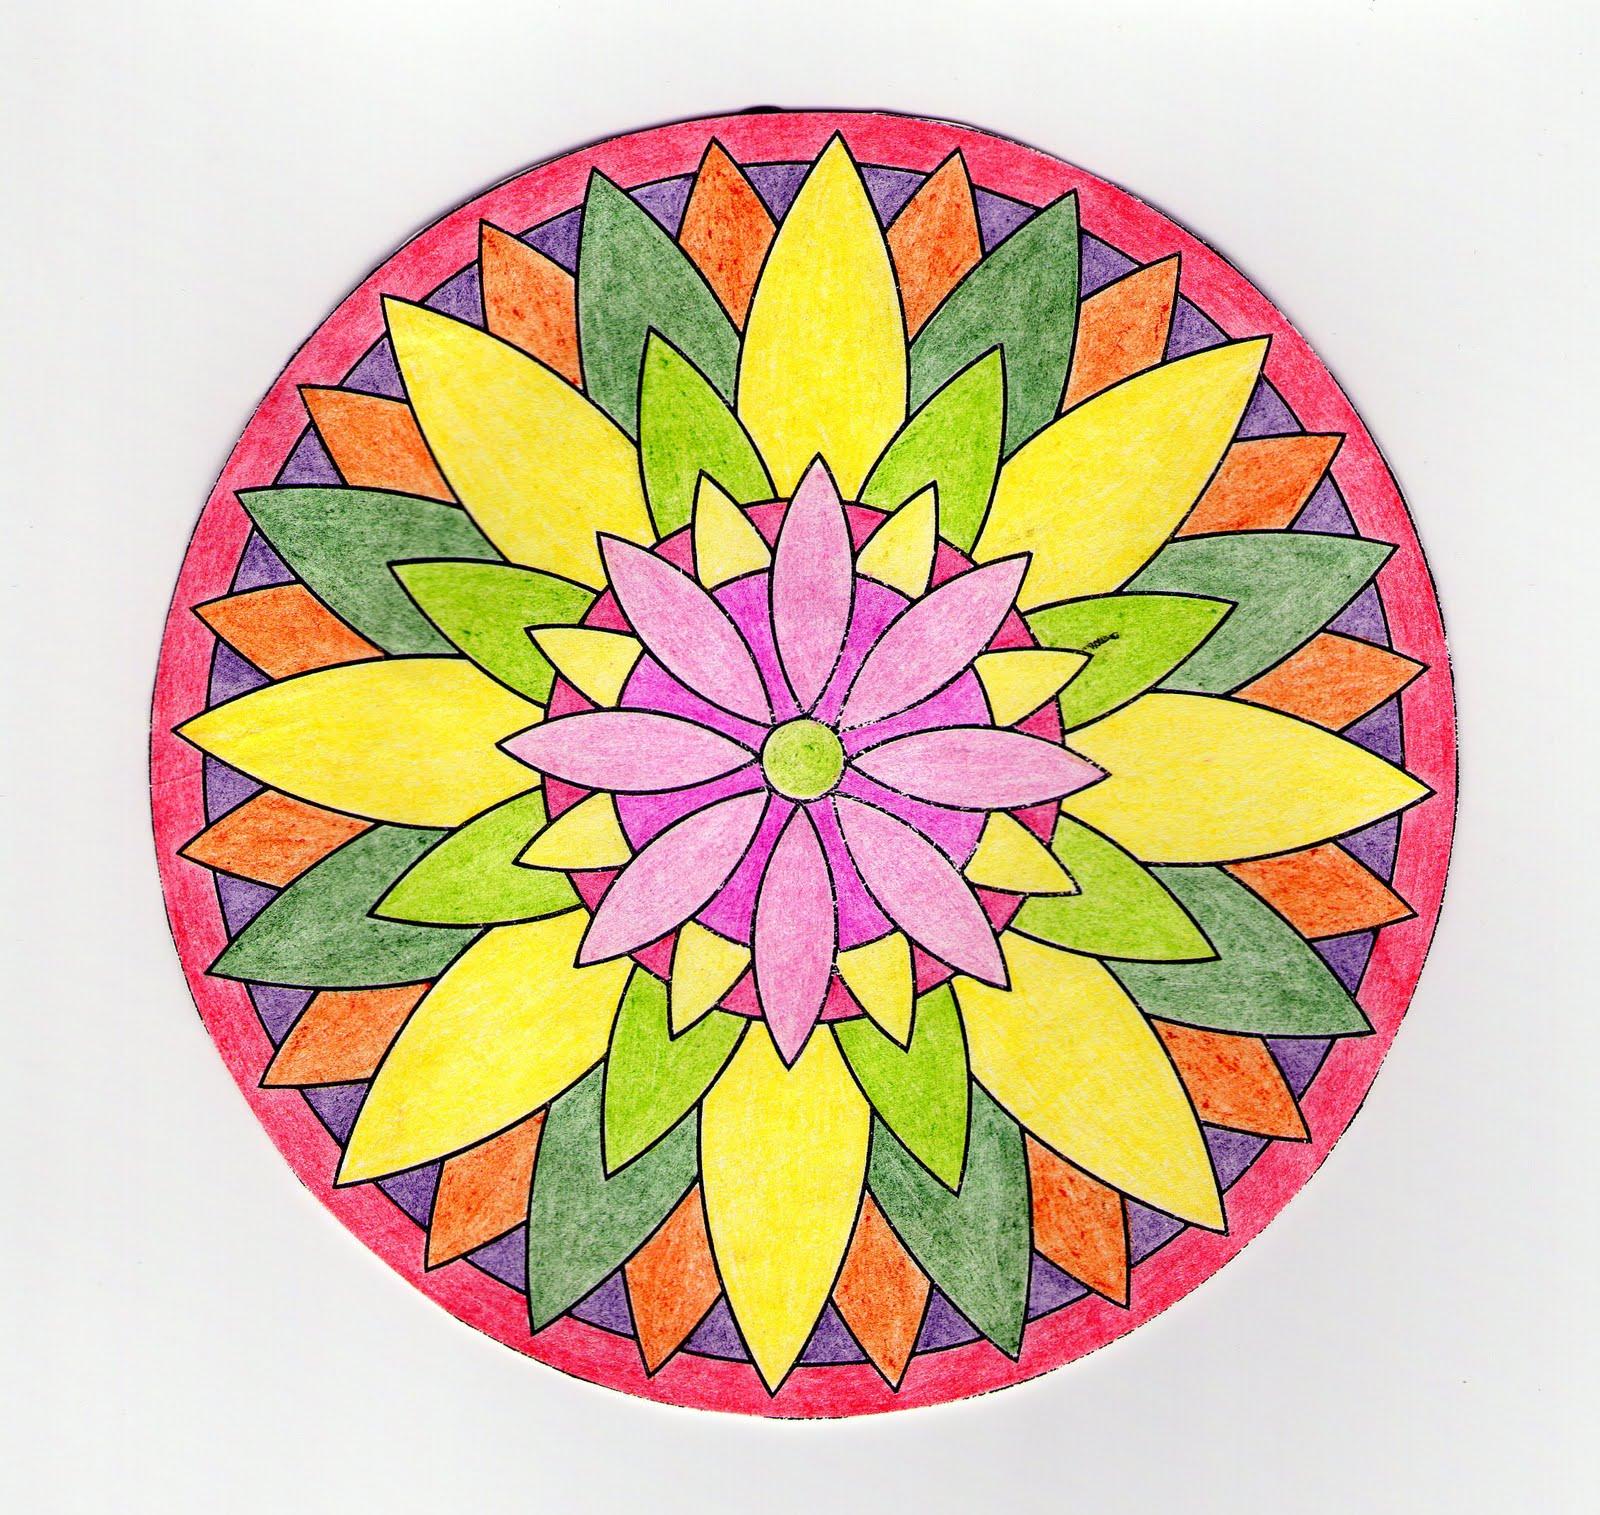 dibujos de mandalas pintados imagui